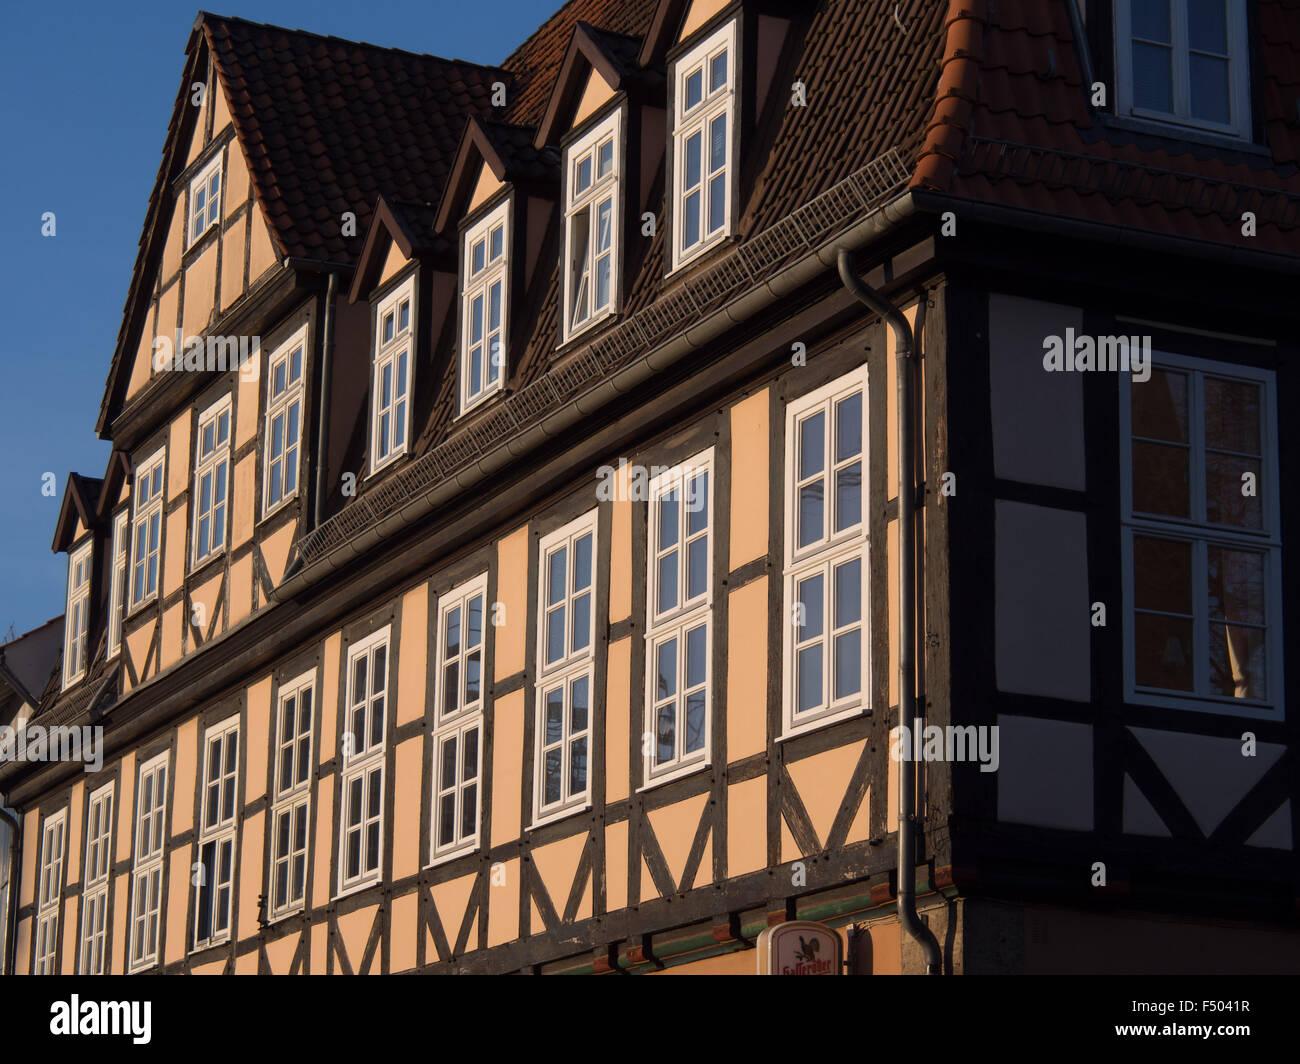 Traditional German architecture in Hanover, Deutschland - Stock Image